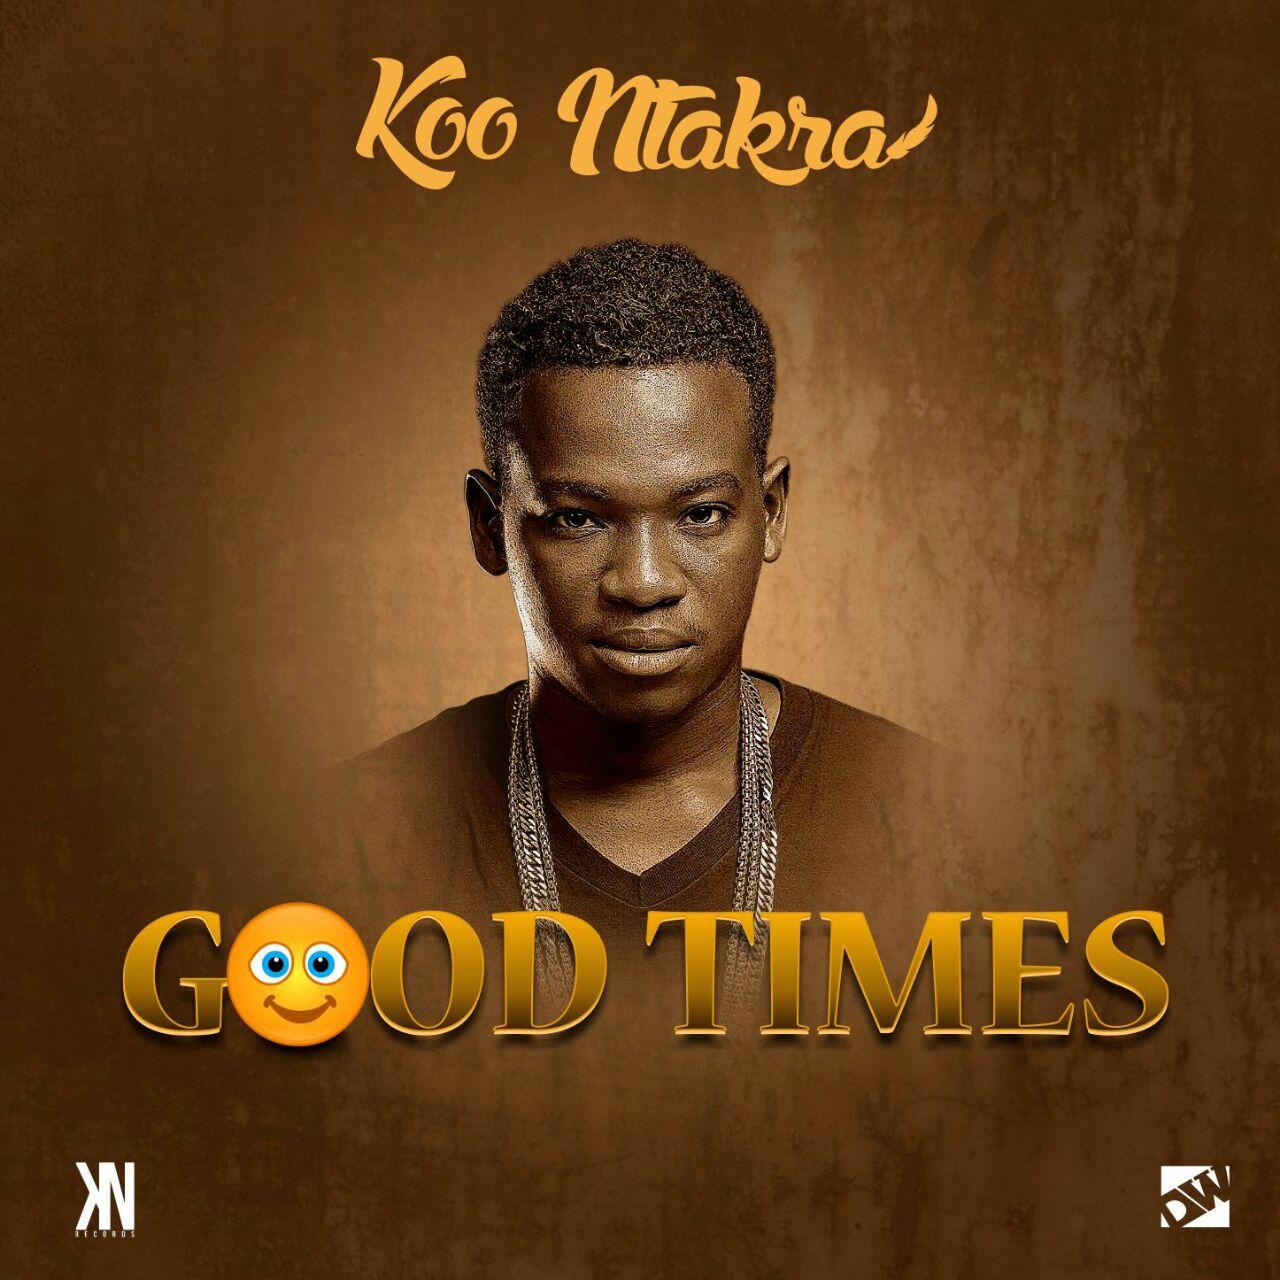 Koo Ntakra – Good Times (Jamie Xx cover)